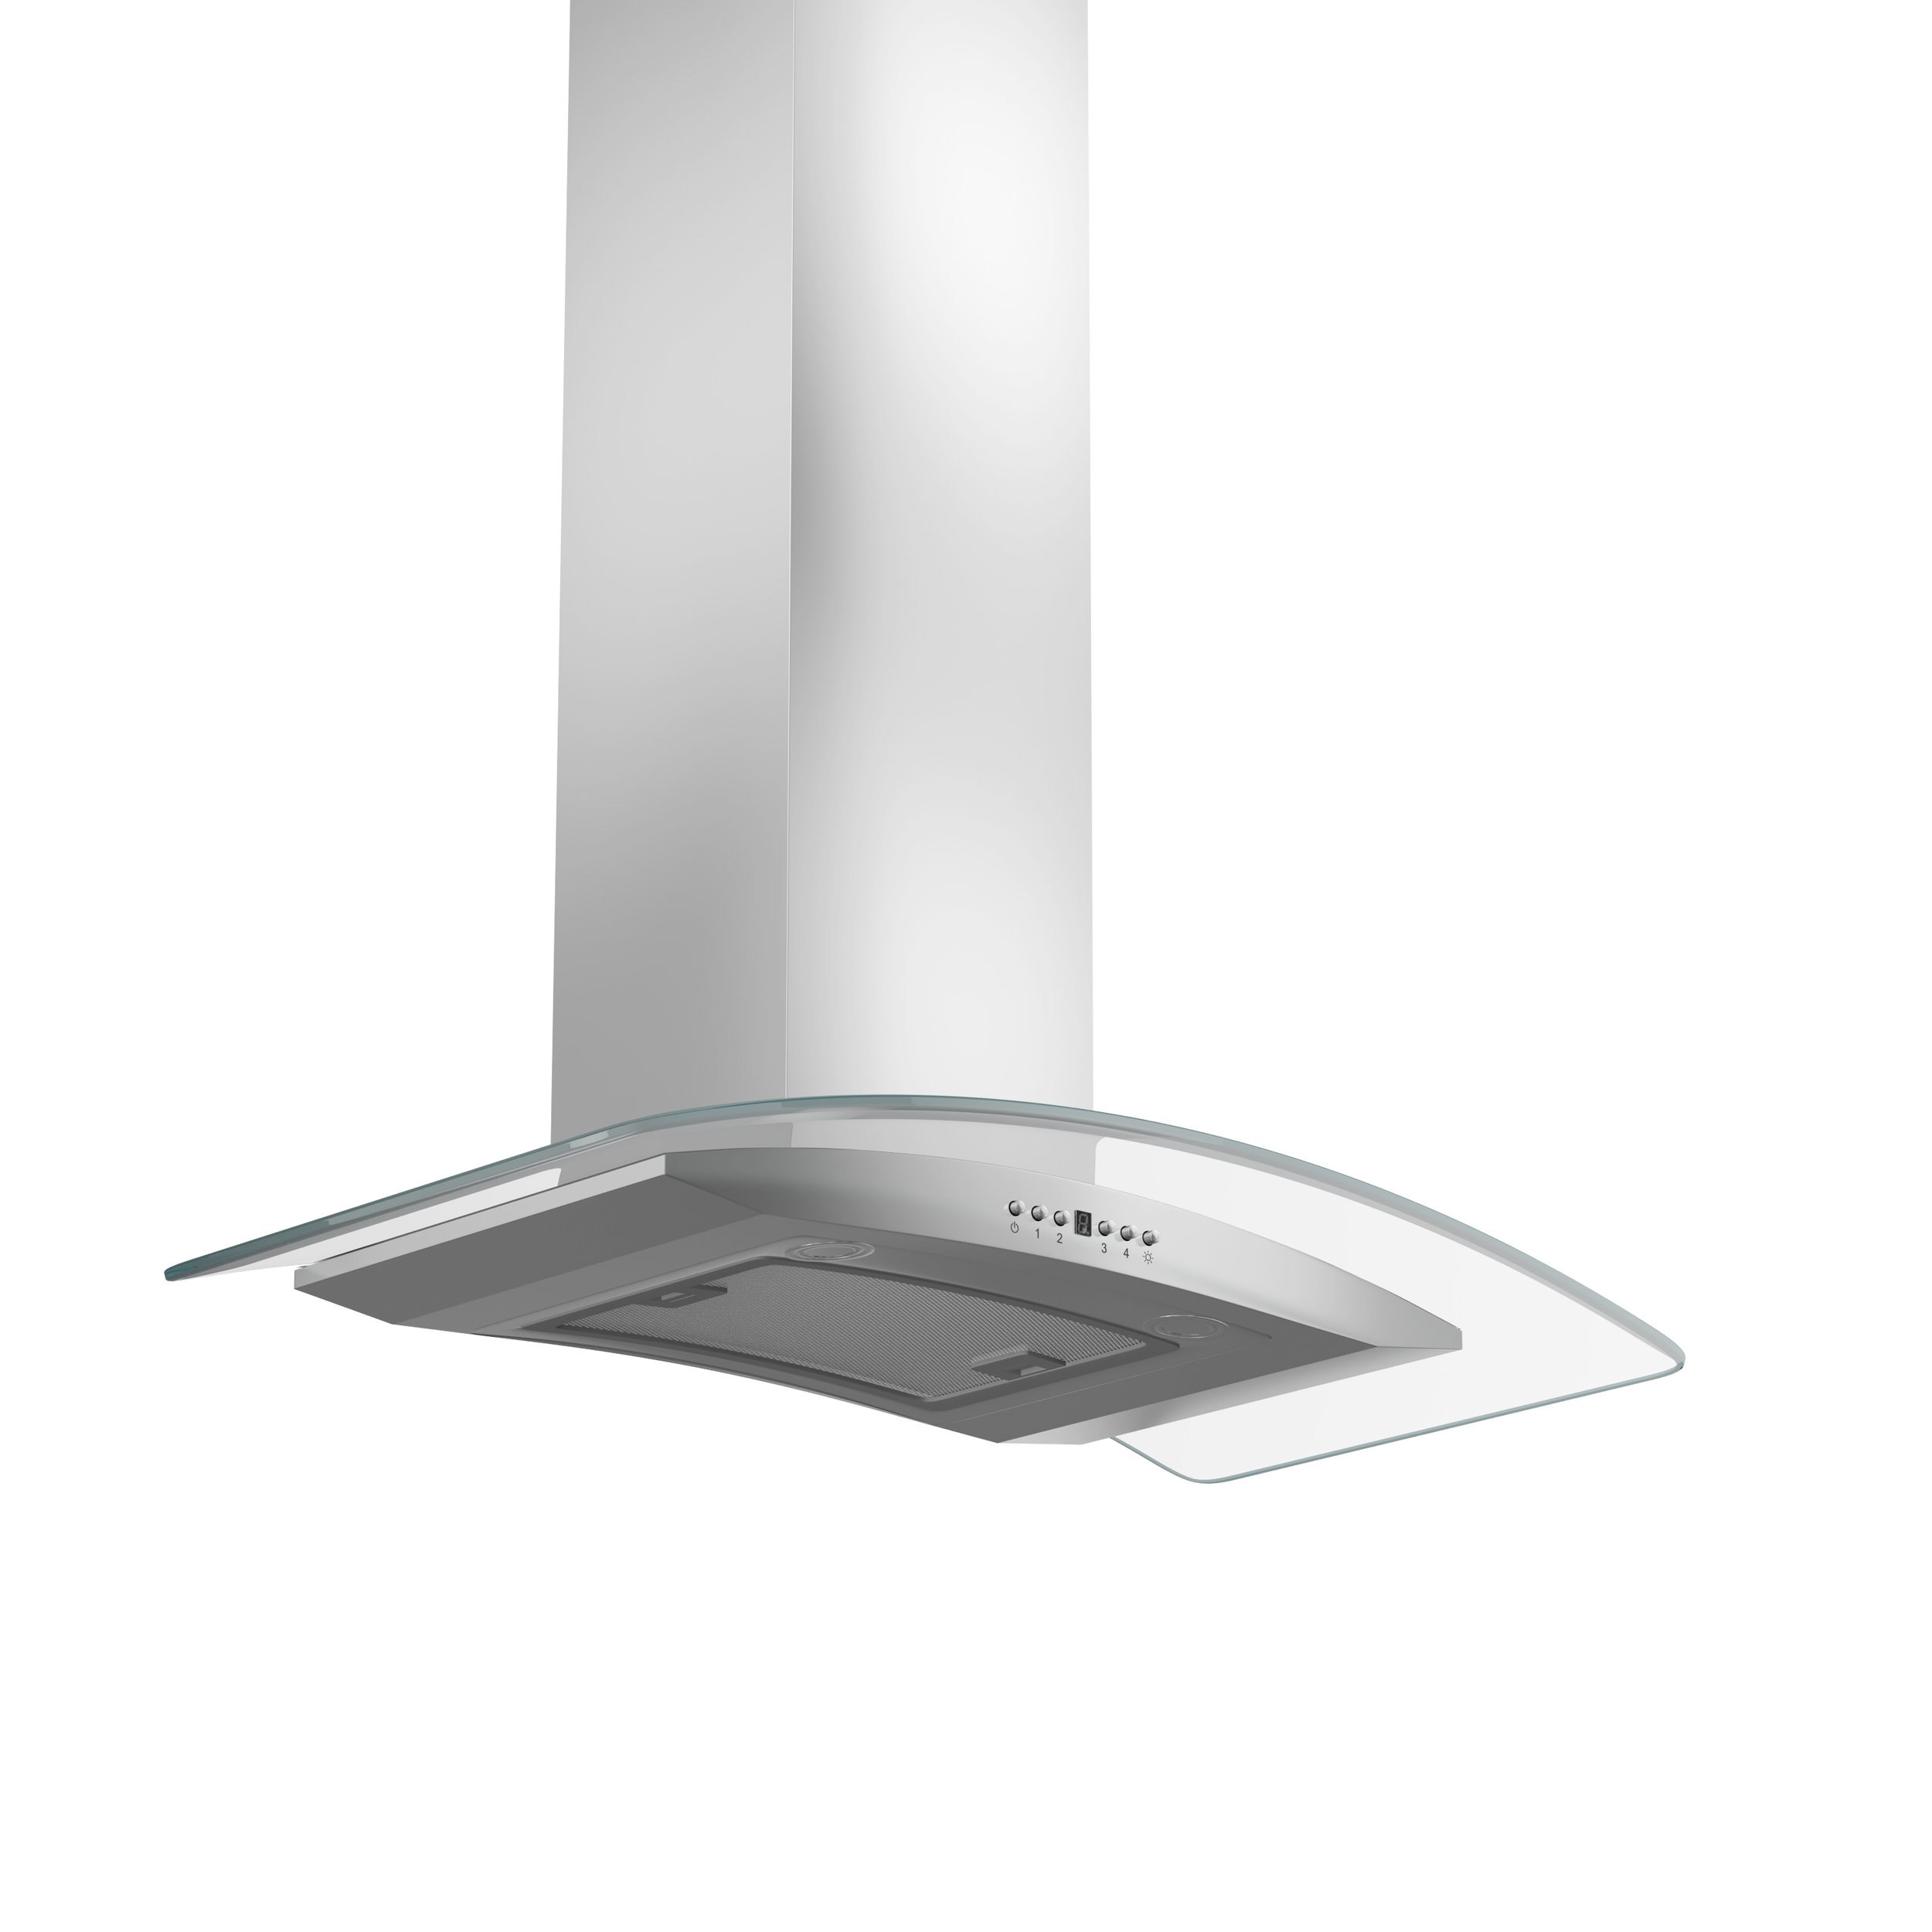 zline-stainless-steel-wall-mounted-range-hood-KN4-side-under.jpg